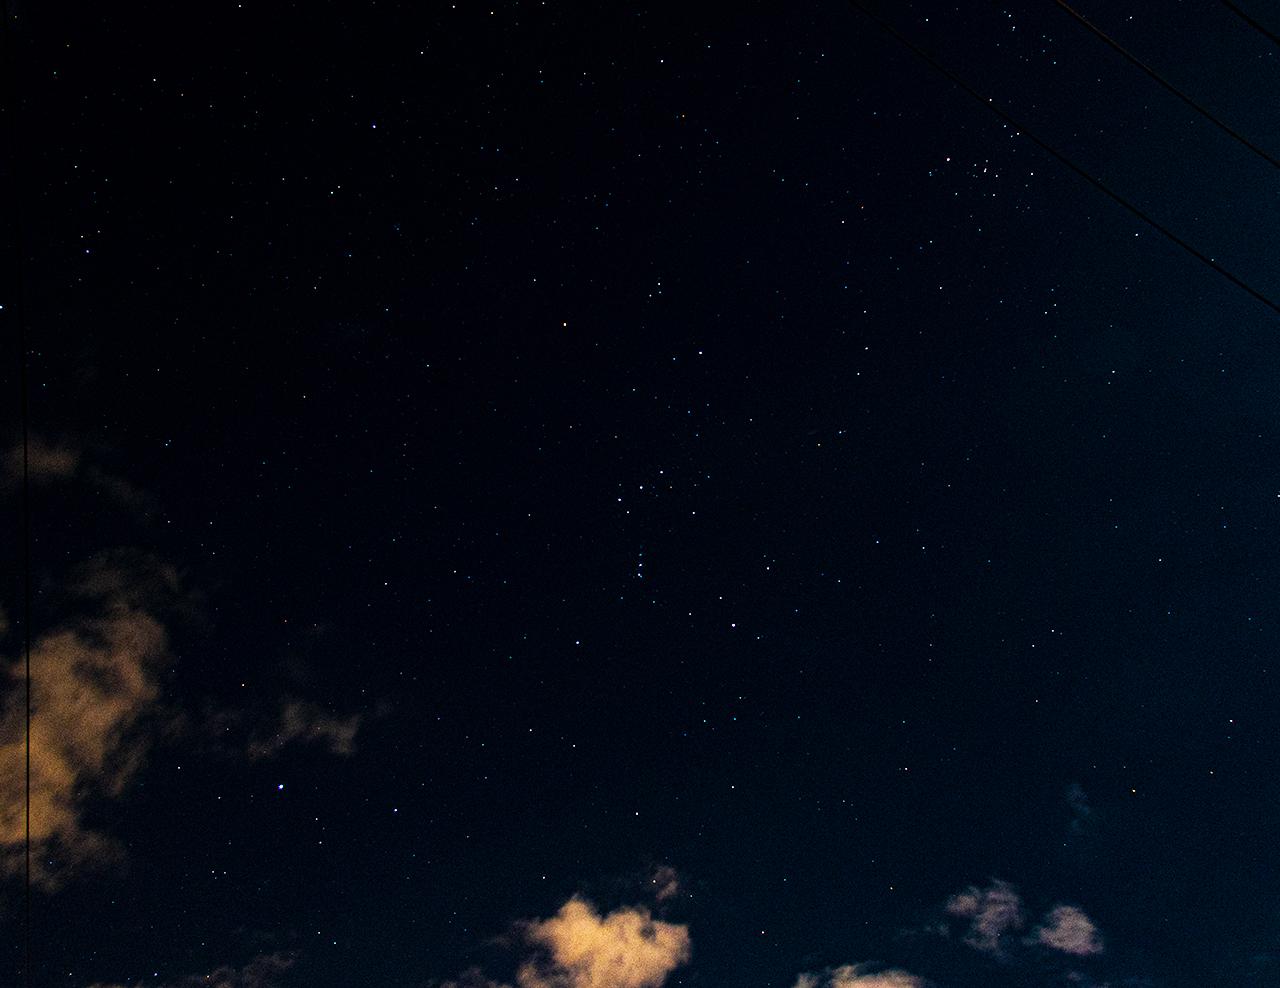 StarryNight on CHRISTMAS